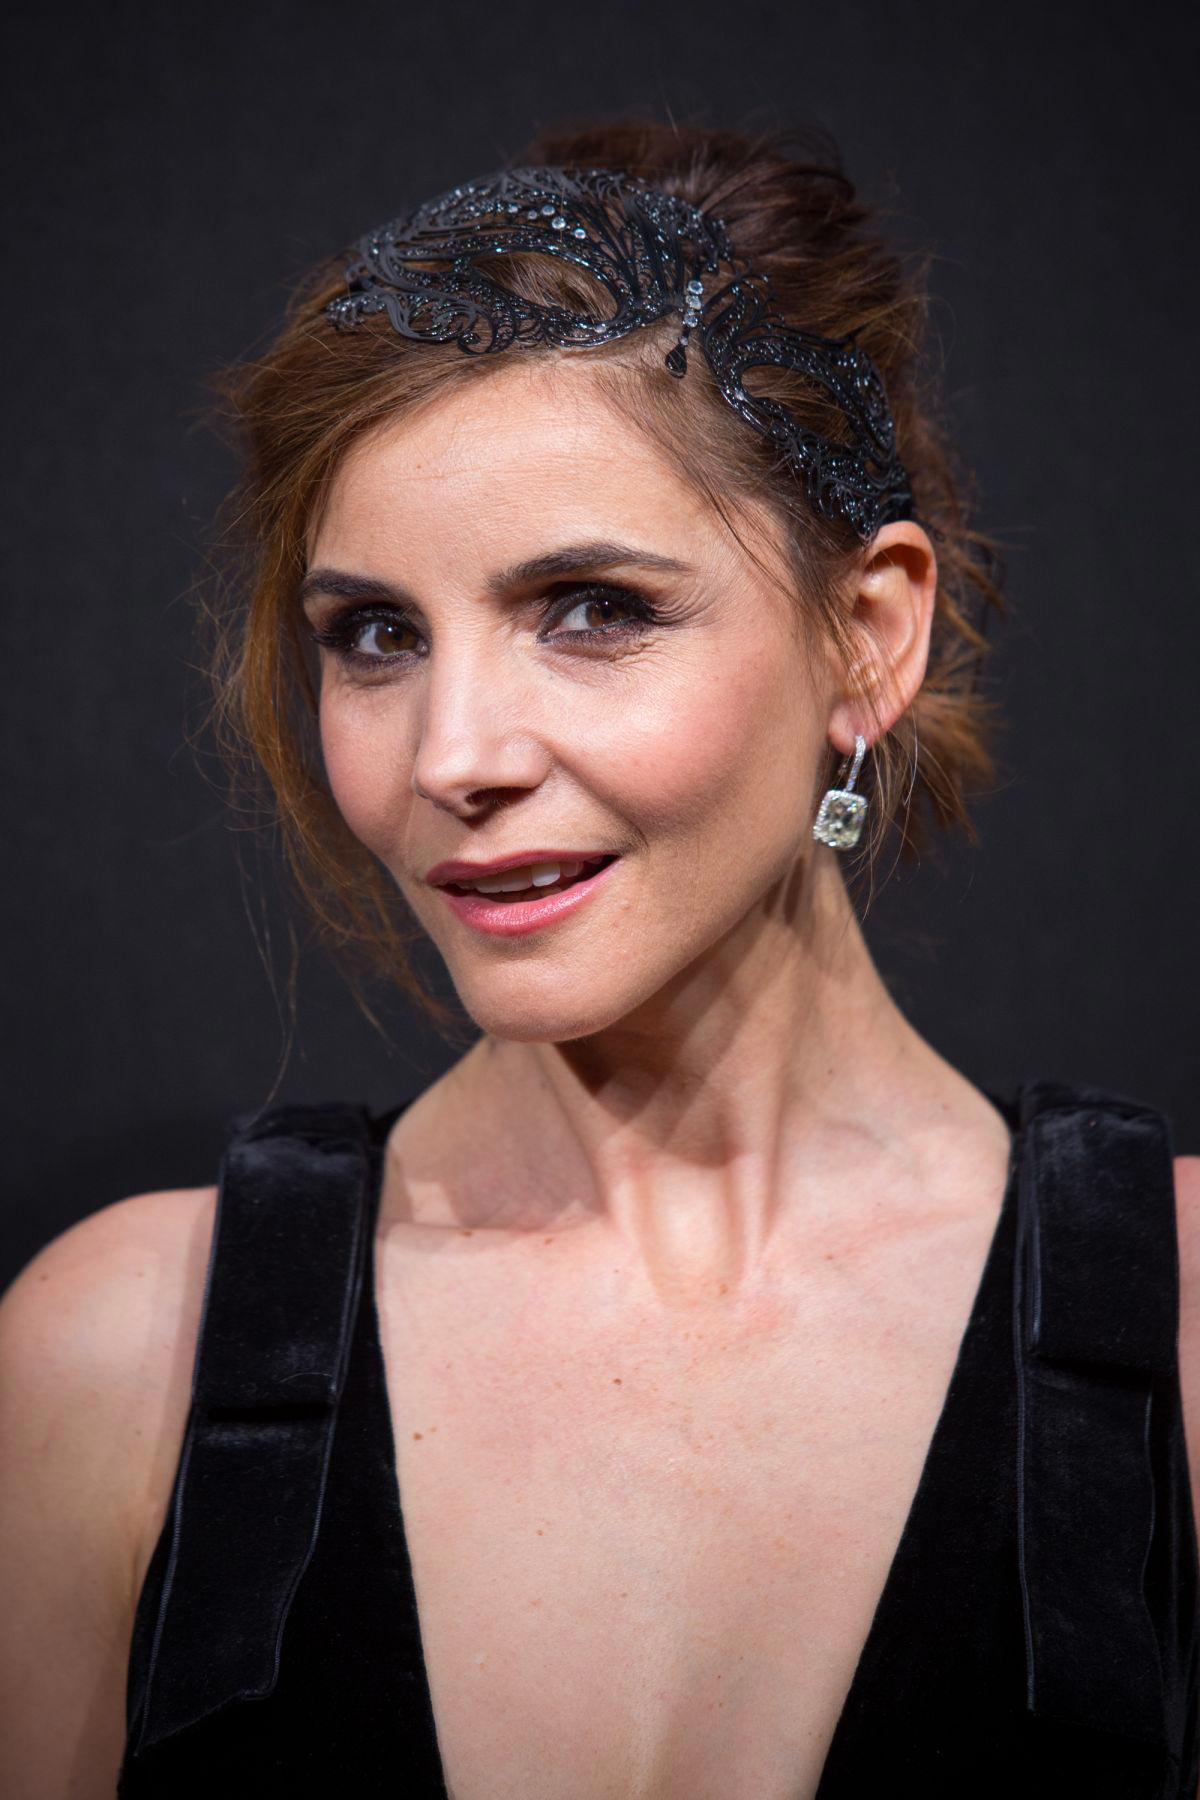 Cannes 2018 - Secret Chopard party - Clothilde Courau - Hair and makeup Massimo Serini